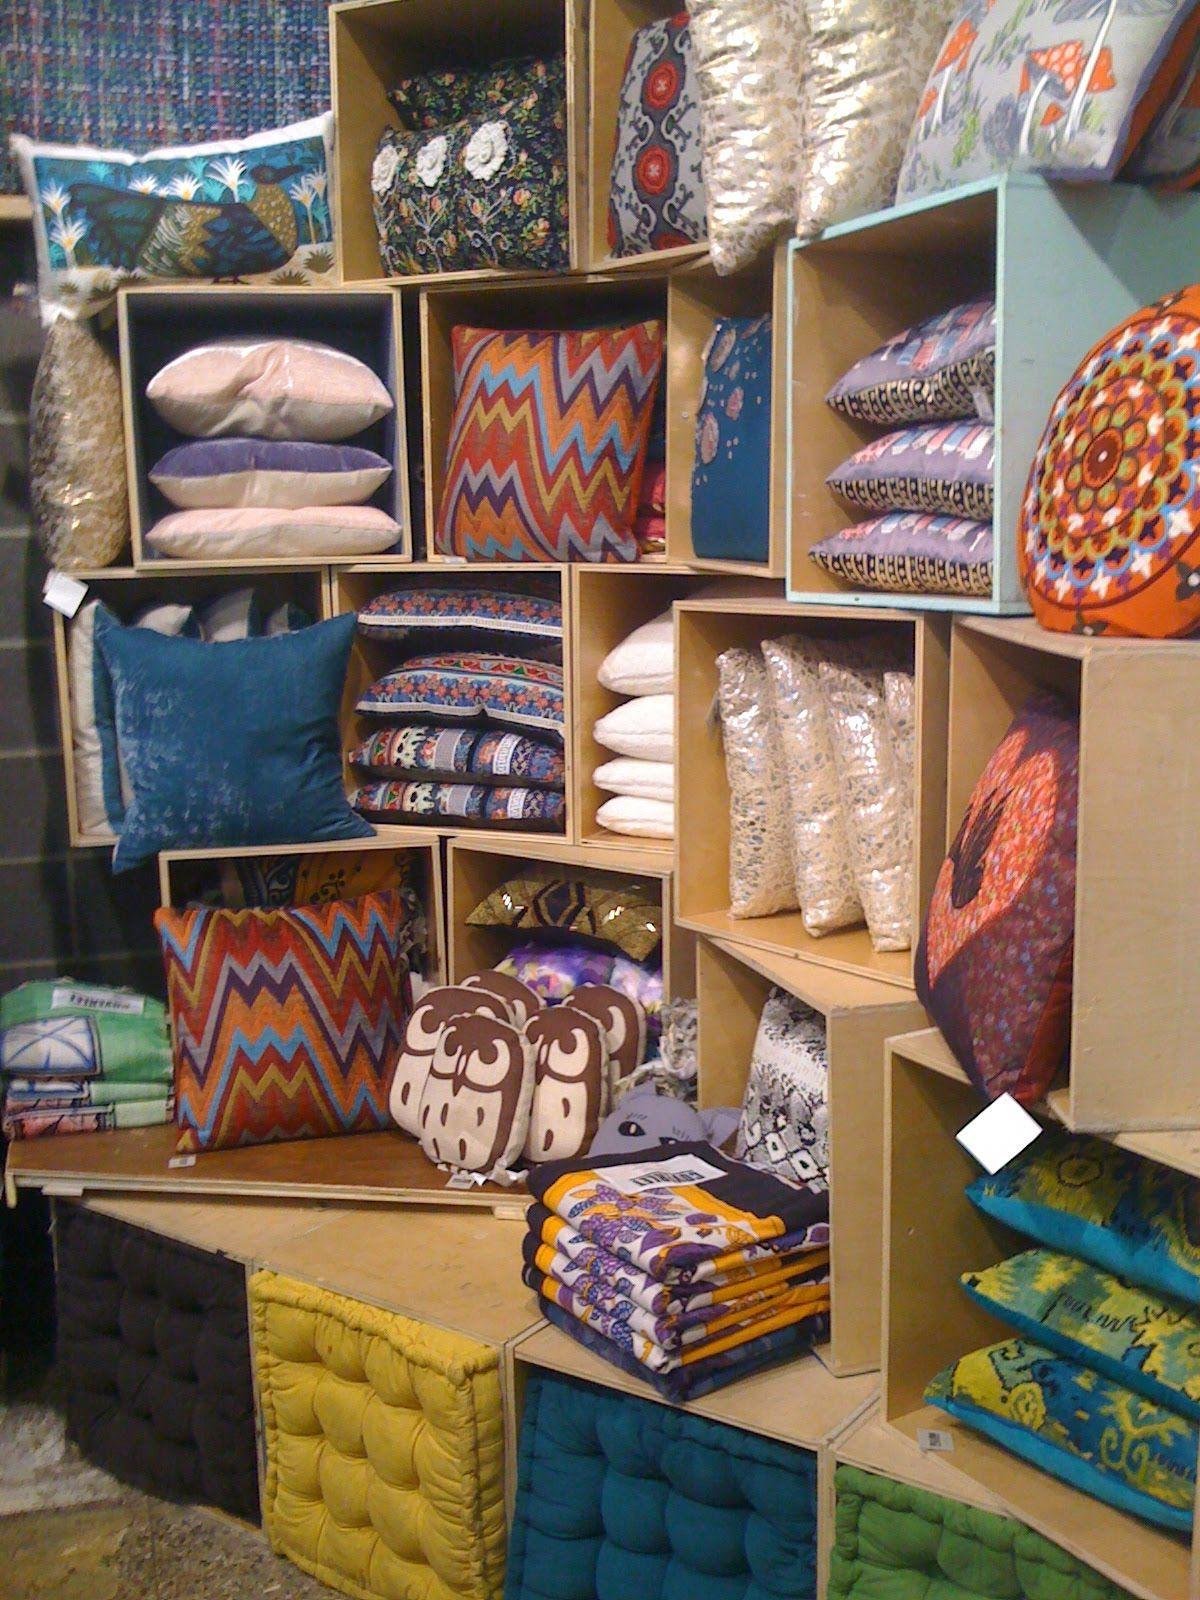 pillow display store display visual merchandising pillows retail shop displays craft fair. Black Bedroom Furniture Sets. Home Design Ideas